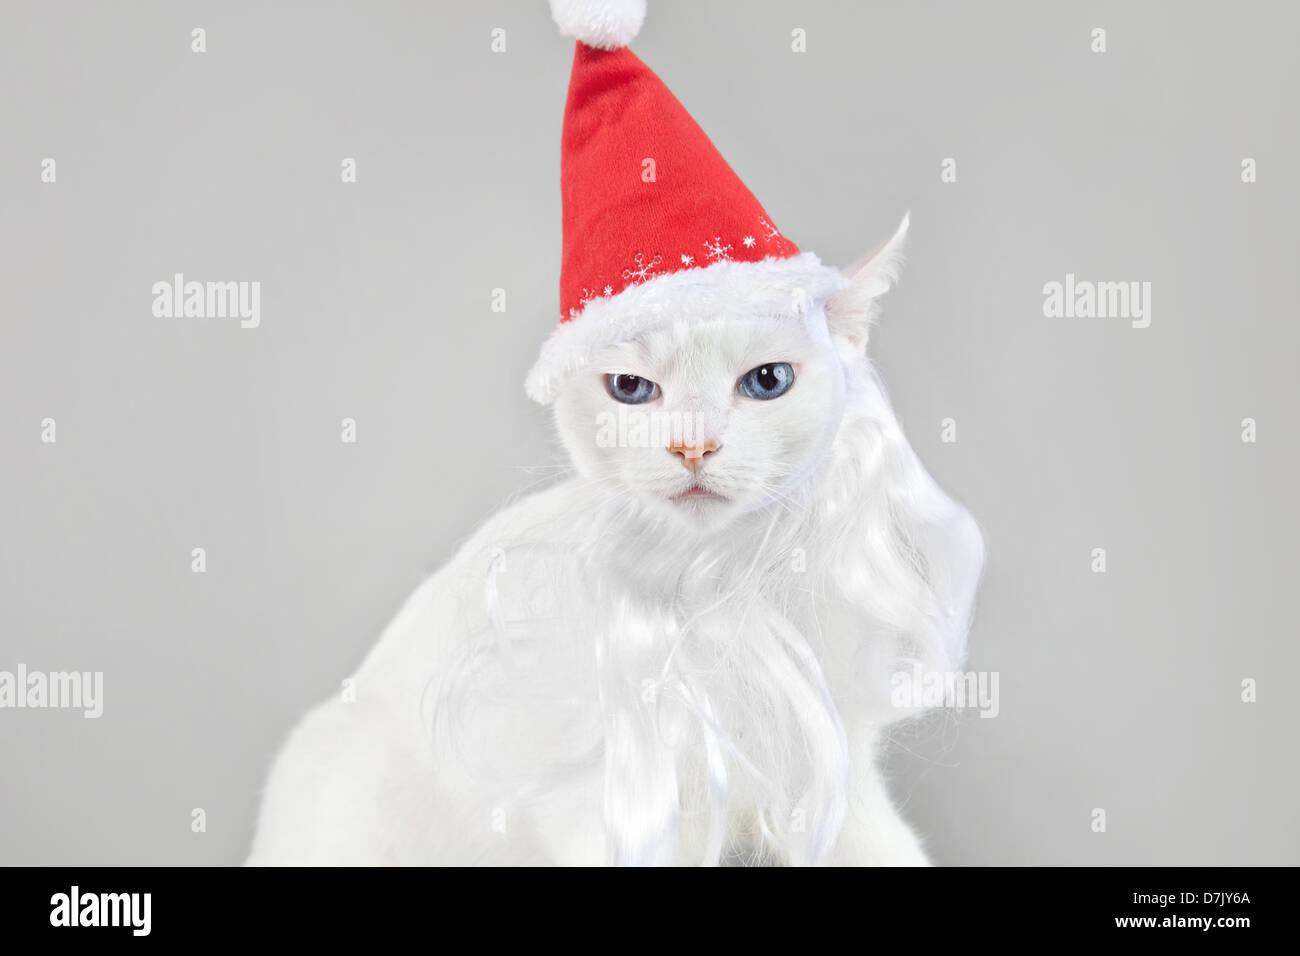 Santa Katze Porträt vor grauem Hintergrund Stockbild